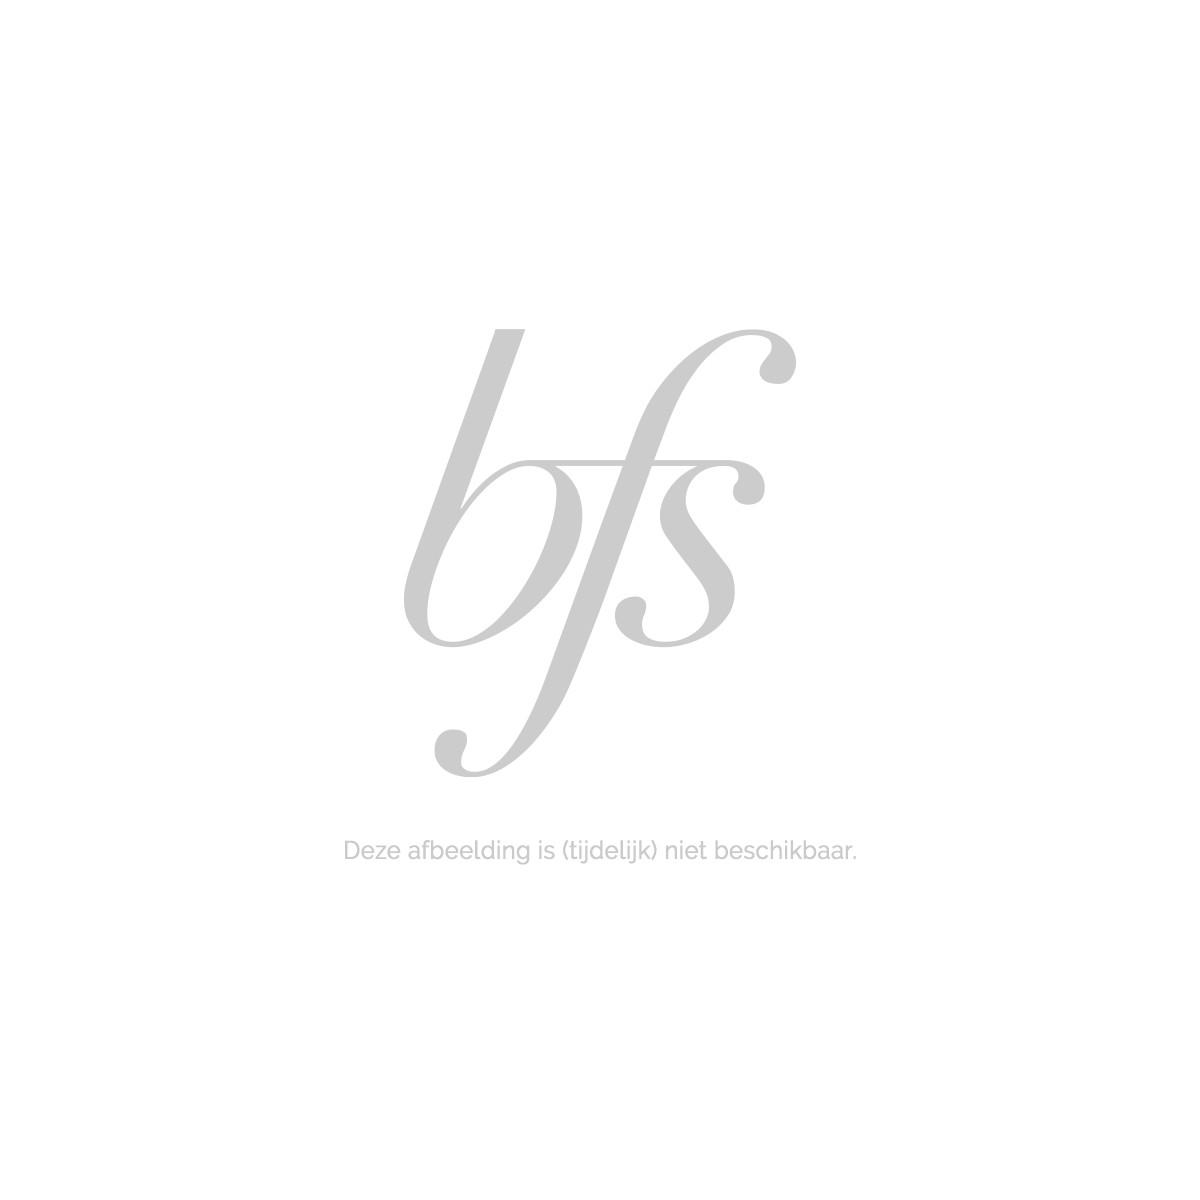 Janzen Scented Candle Fuchsia 69 135 Ml